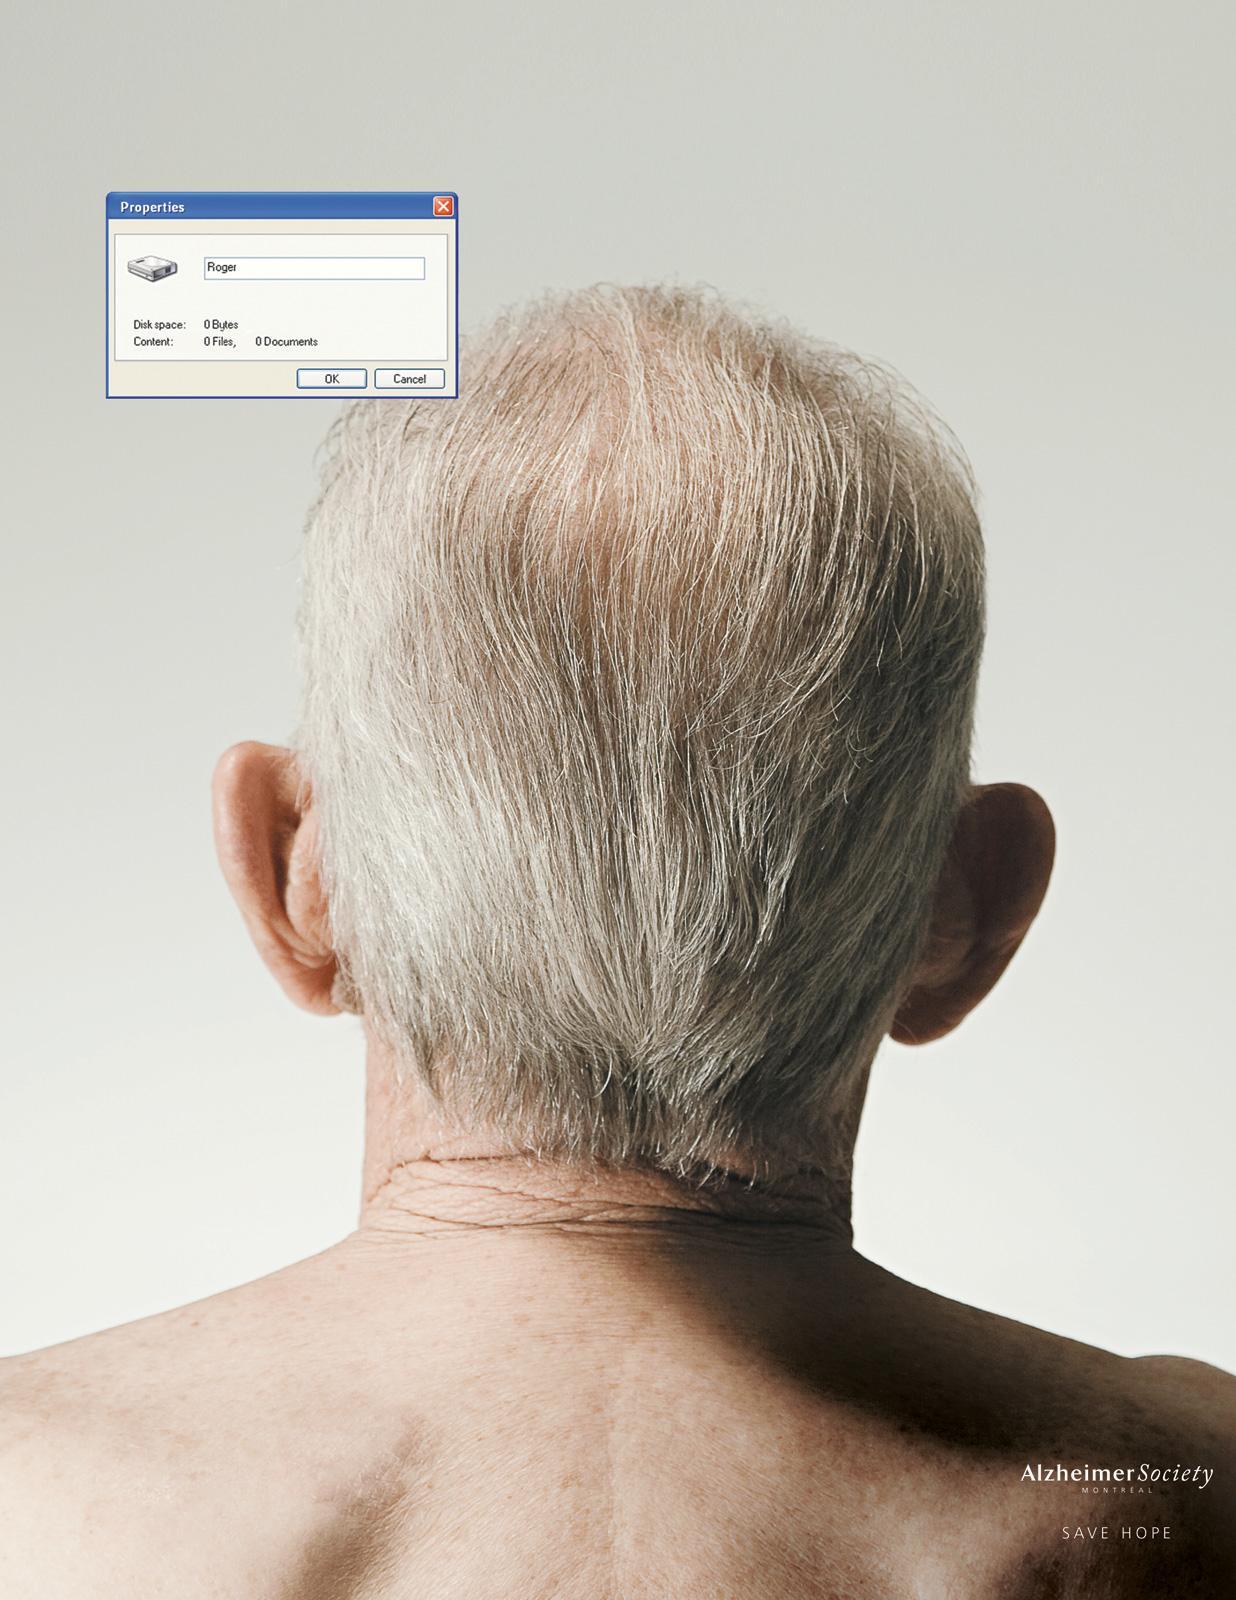 Alzheimer Society Print Ad -  Zero